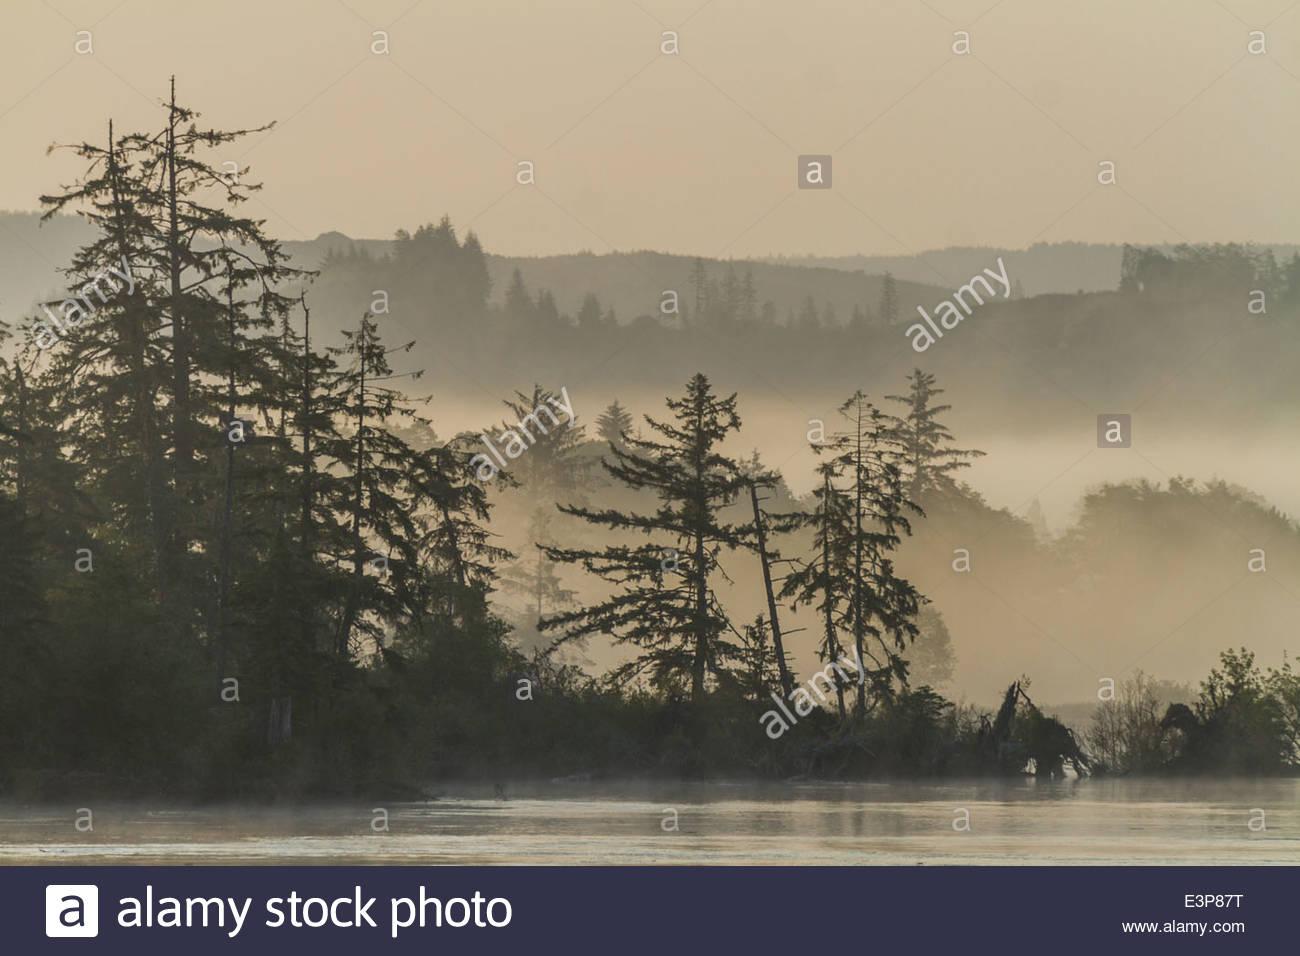 Morning Sunlight Illuminates Layers Of Fog, River & Trees Of The Columbia River & Washington State, USA - Stock Image